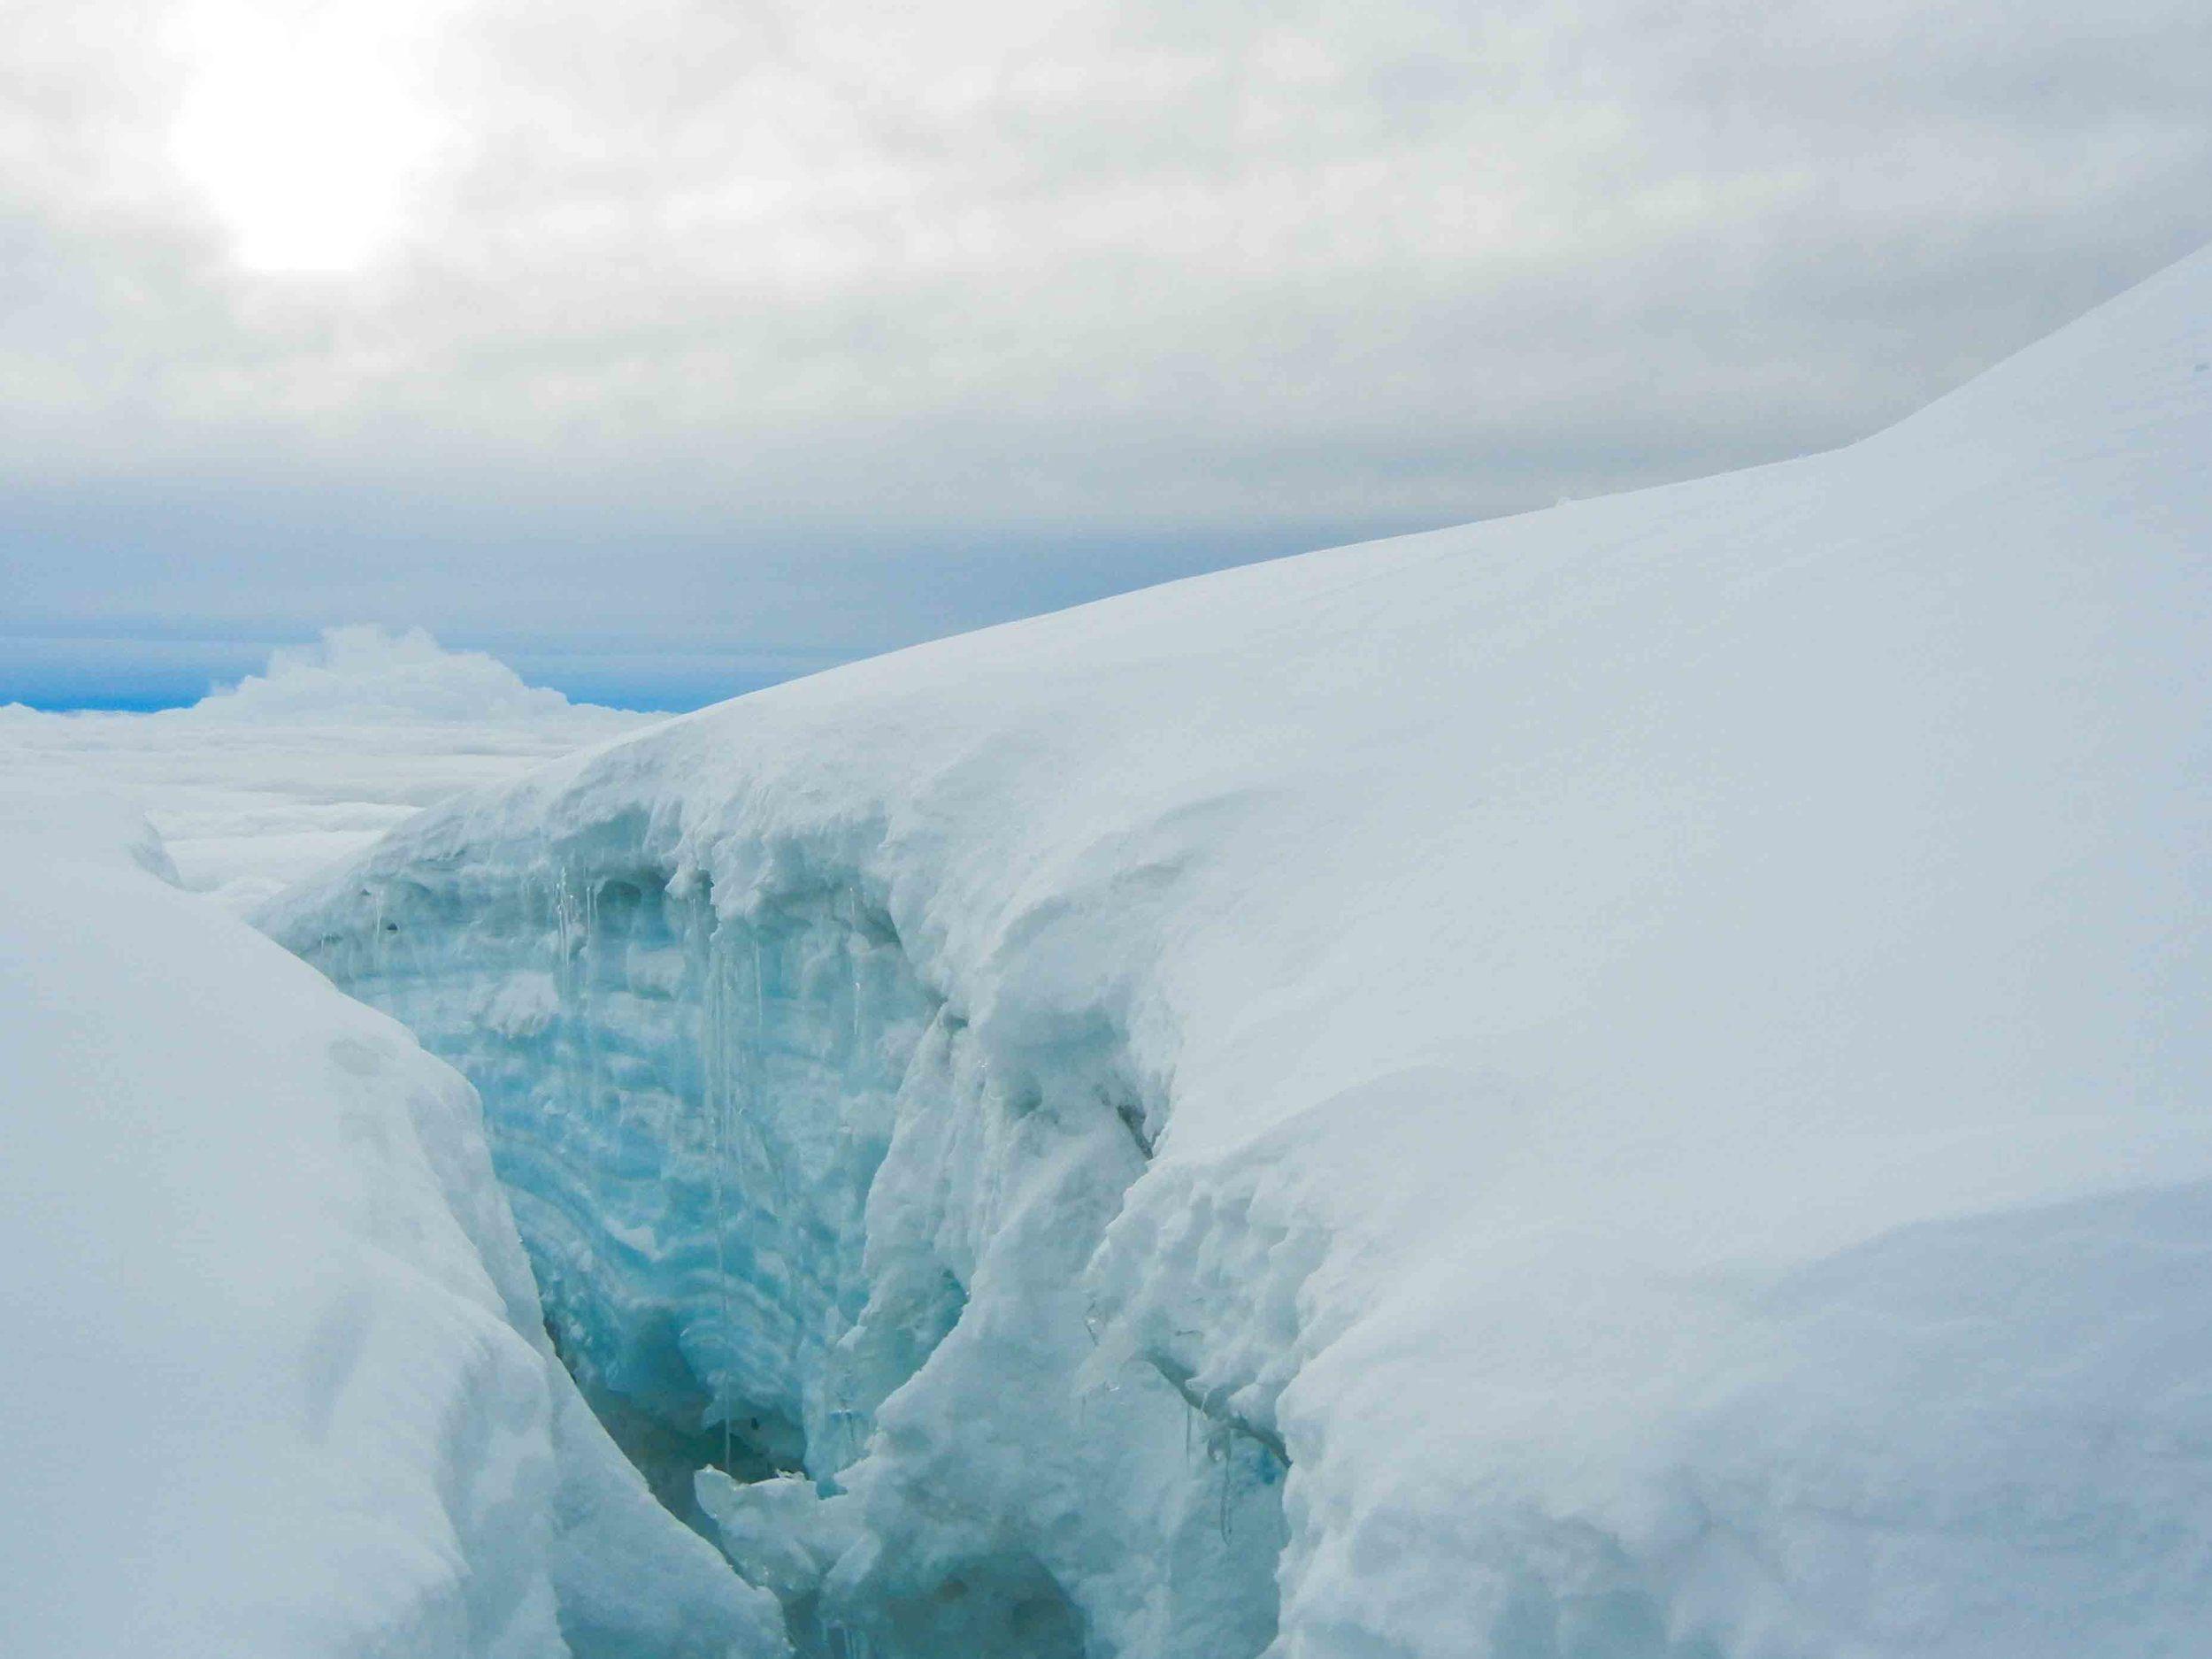 2015_12_S_LaPaz_IceClimbing-2.jpg